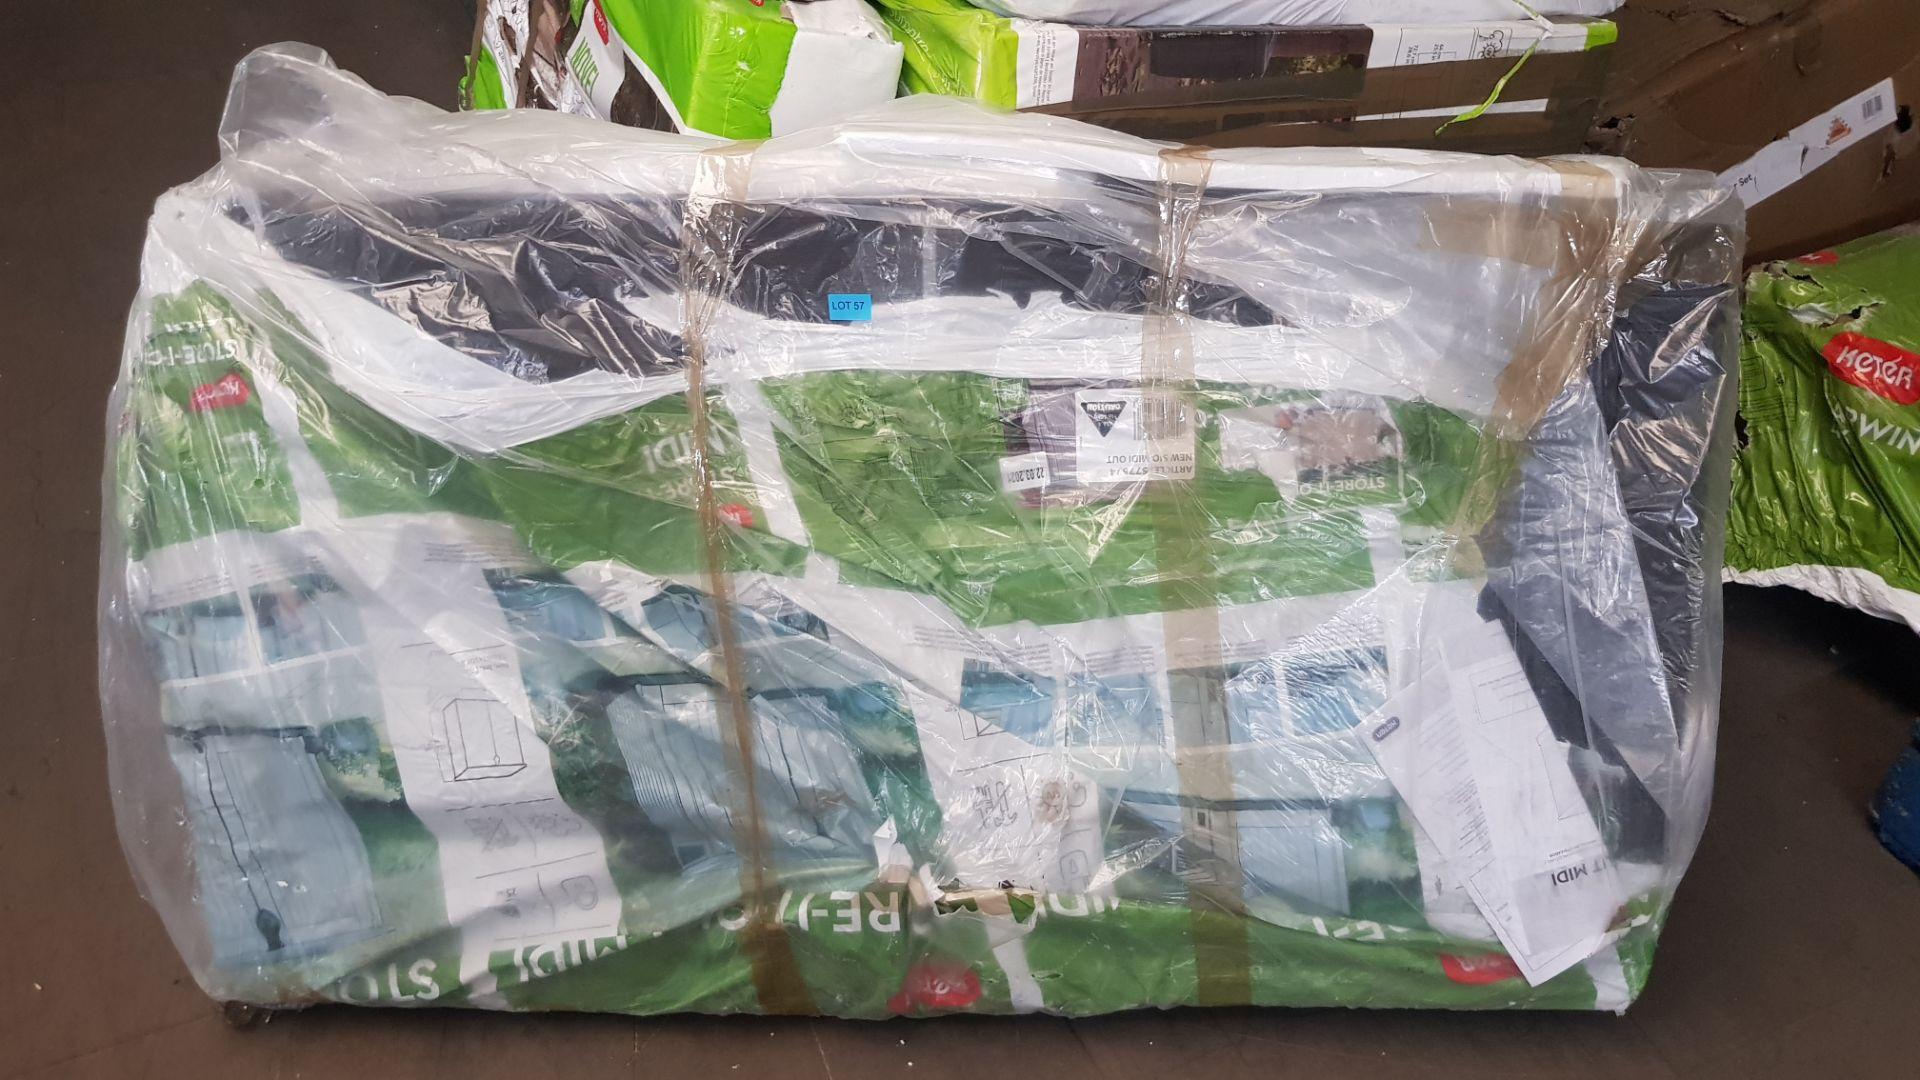 (P4) 1x Keter Store It Out Midi 845L RRP £105. (H110x W74x L130cm) - Image 2 of 2